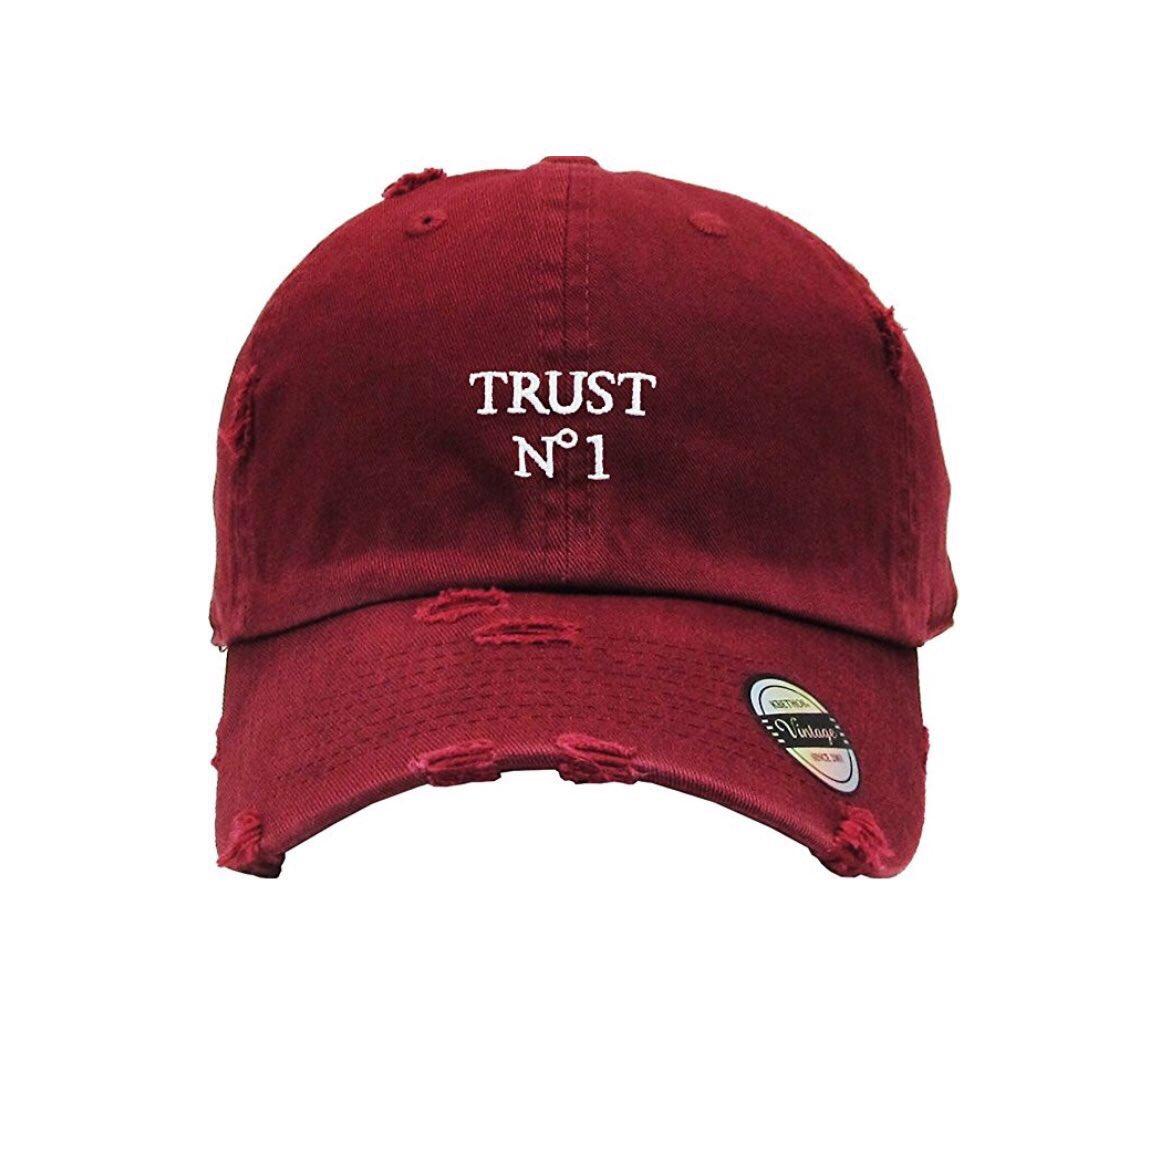 Trust No1 Cap  Shop: https://t.co/KzGvF0...